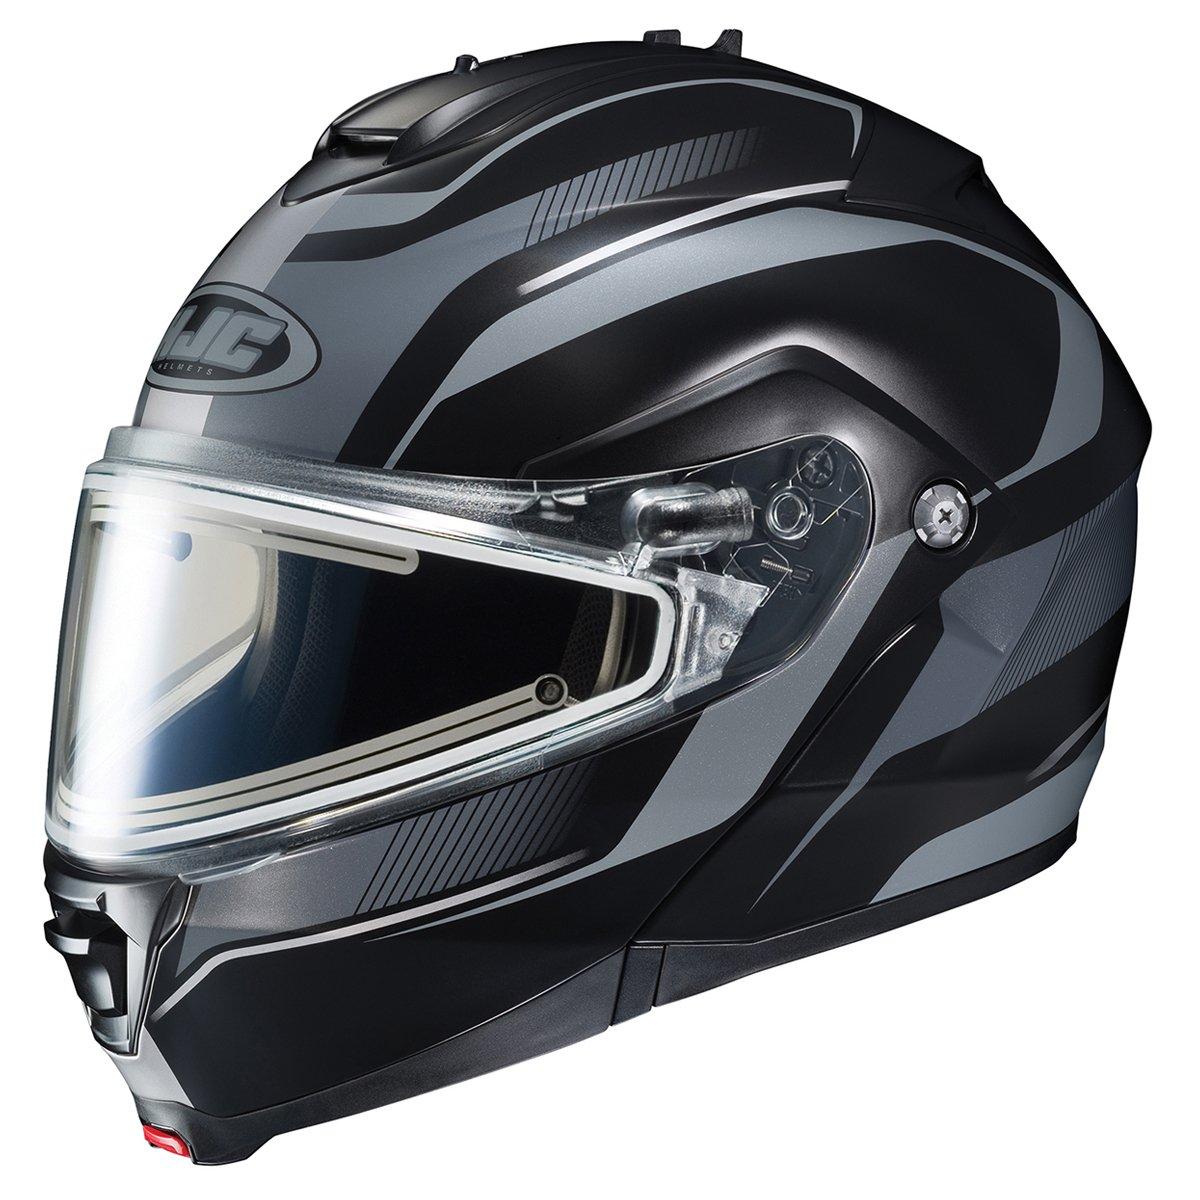 HJC IS-MAX2SN Style Modular Snow Helmet Frameless Electric Shield (MC-5F Black/Silver, XX-Large)